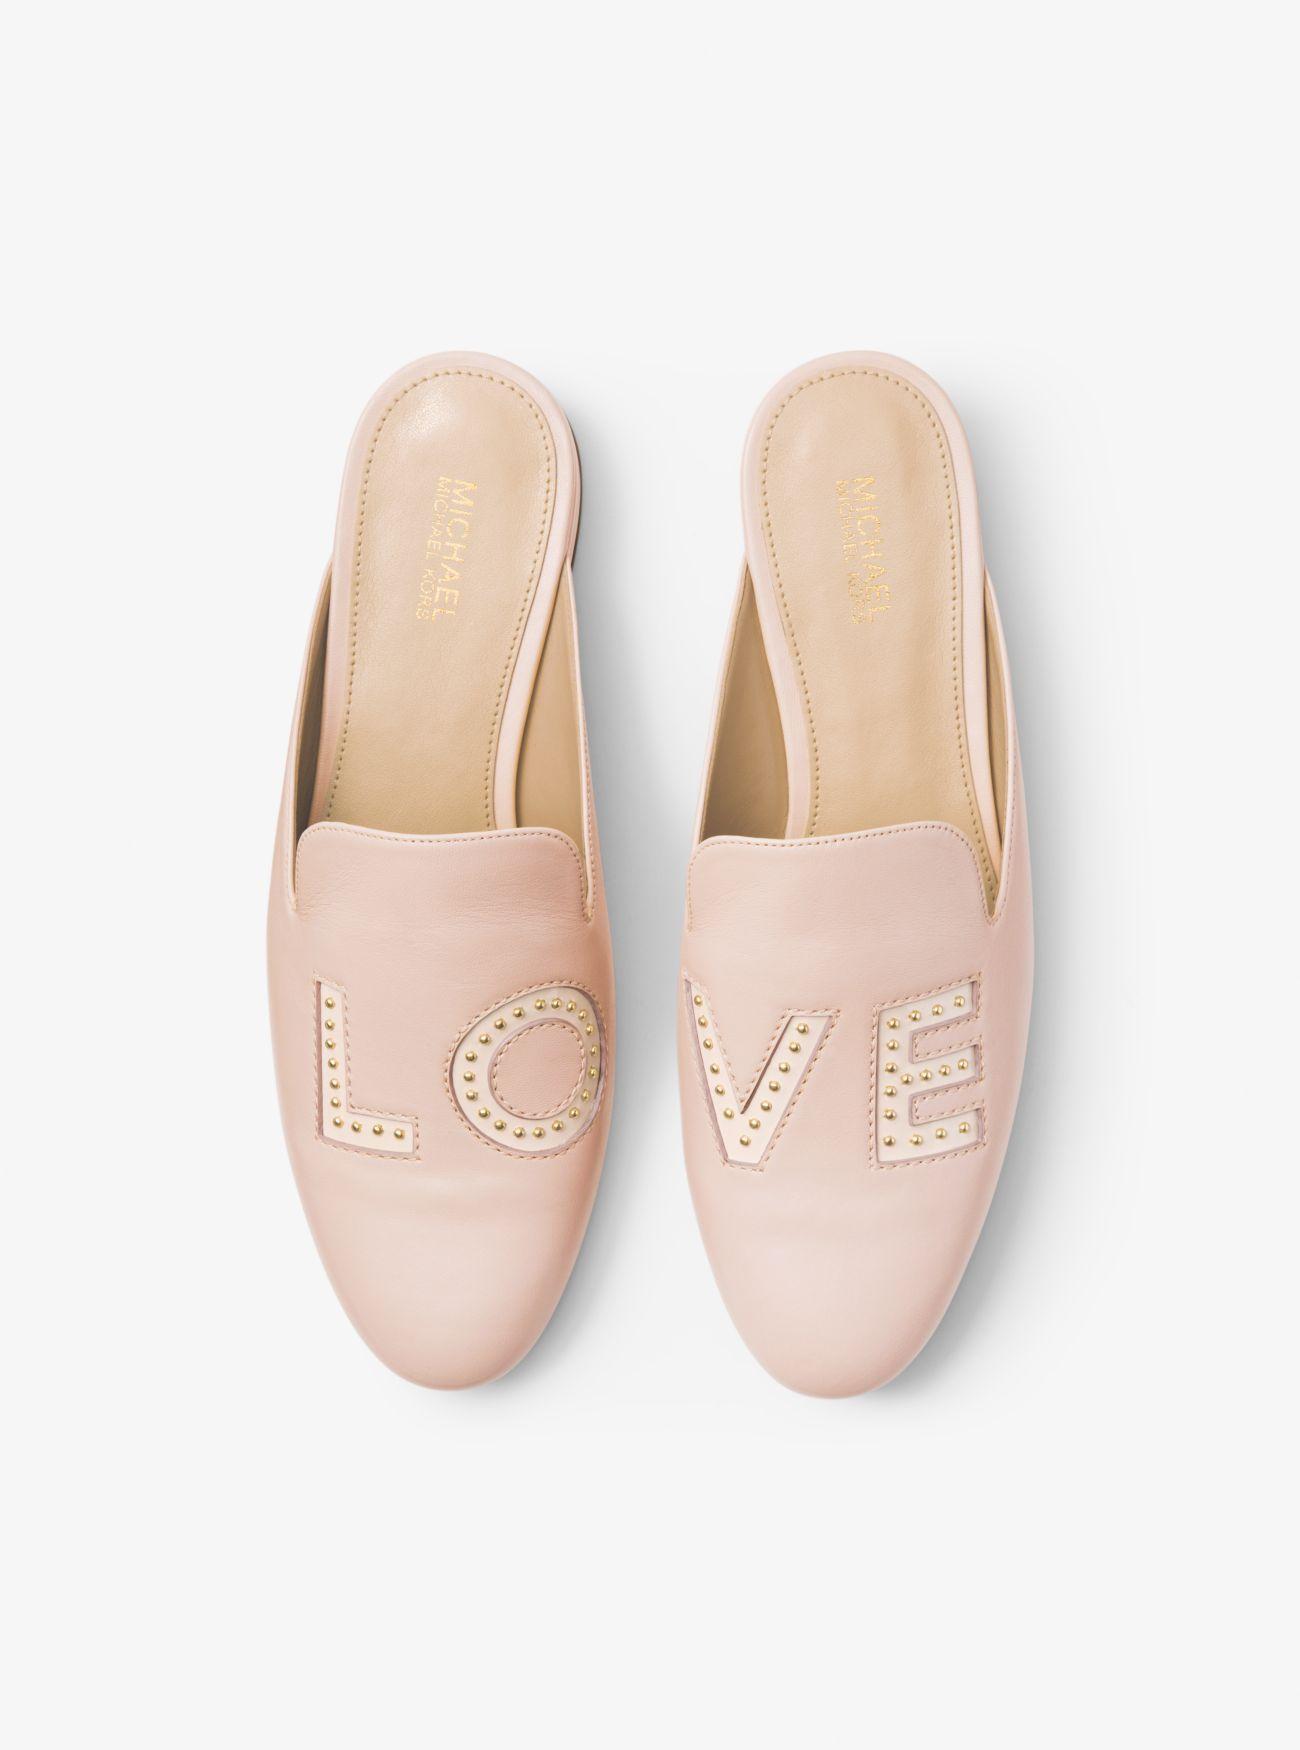 4c65c1486f3c Natasha Love Leather Slide | Shoes | Leather mules, Shoes, Leather